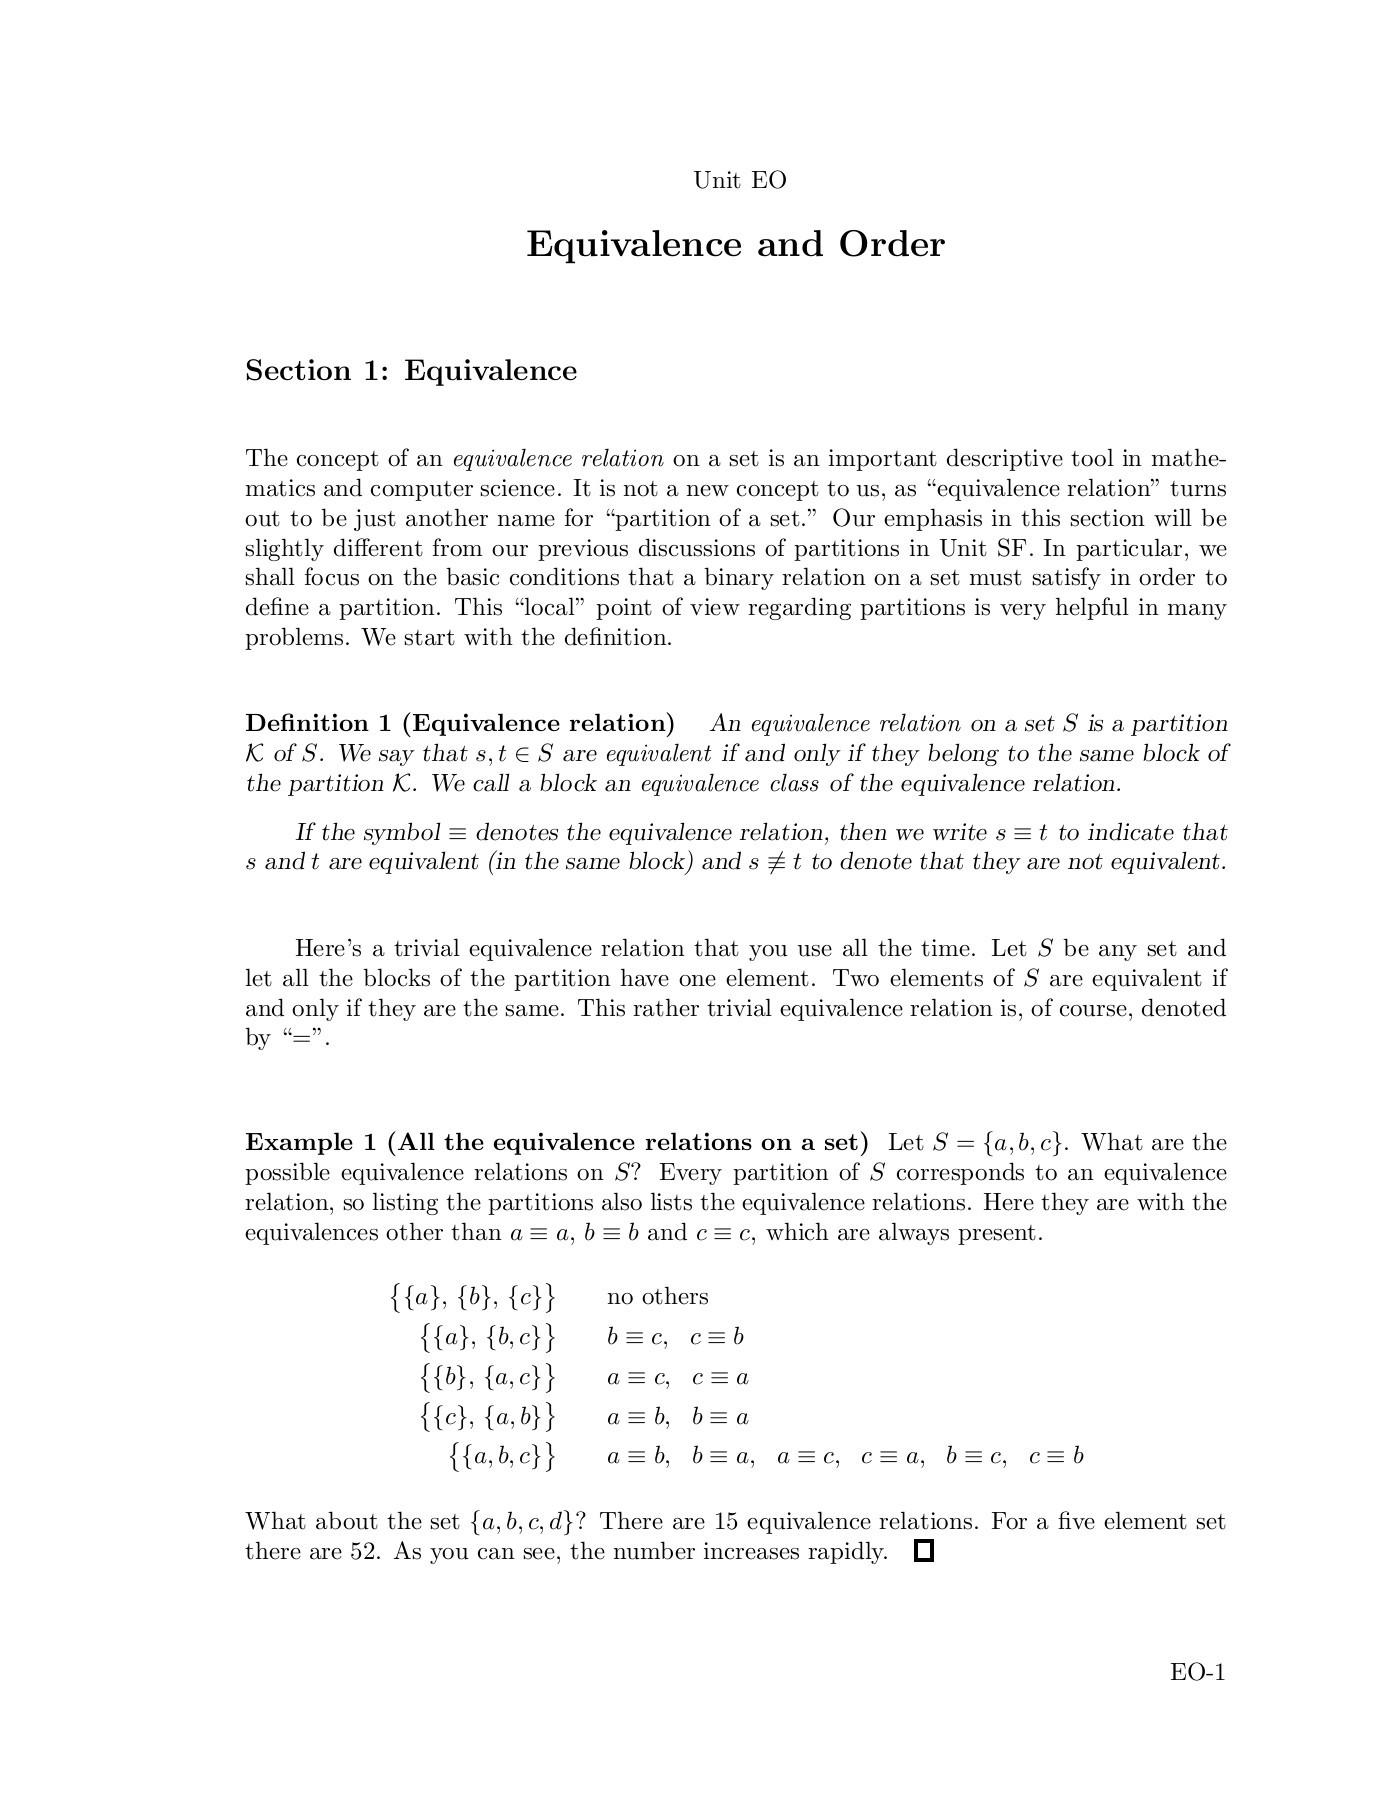 Definition Of Non Equivalent Set In Mathematics